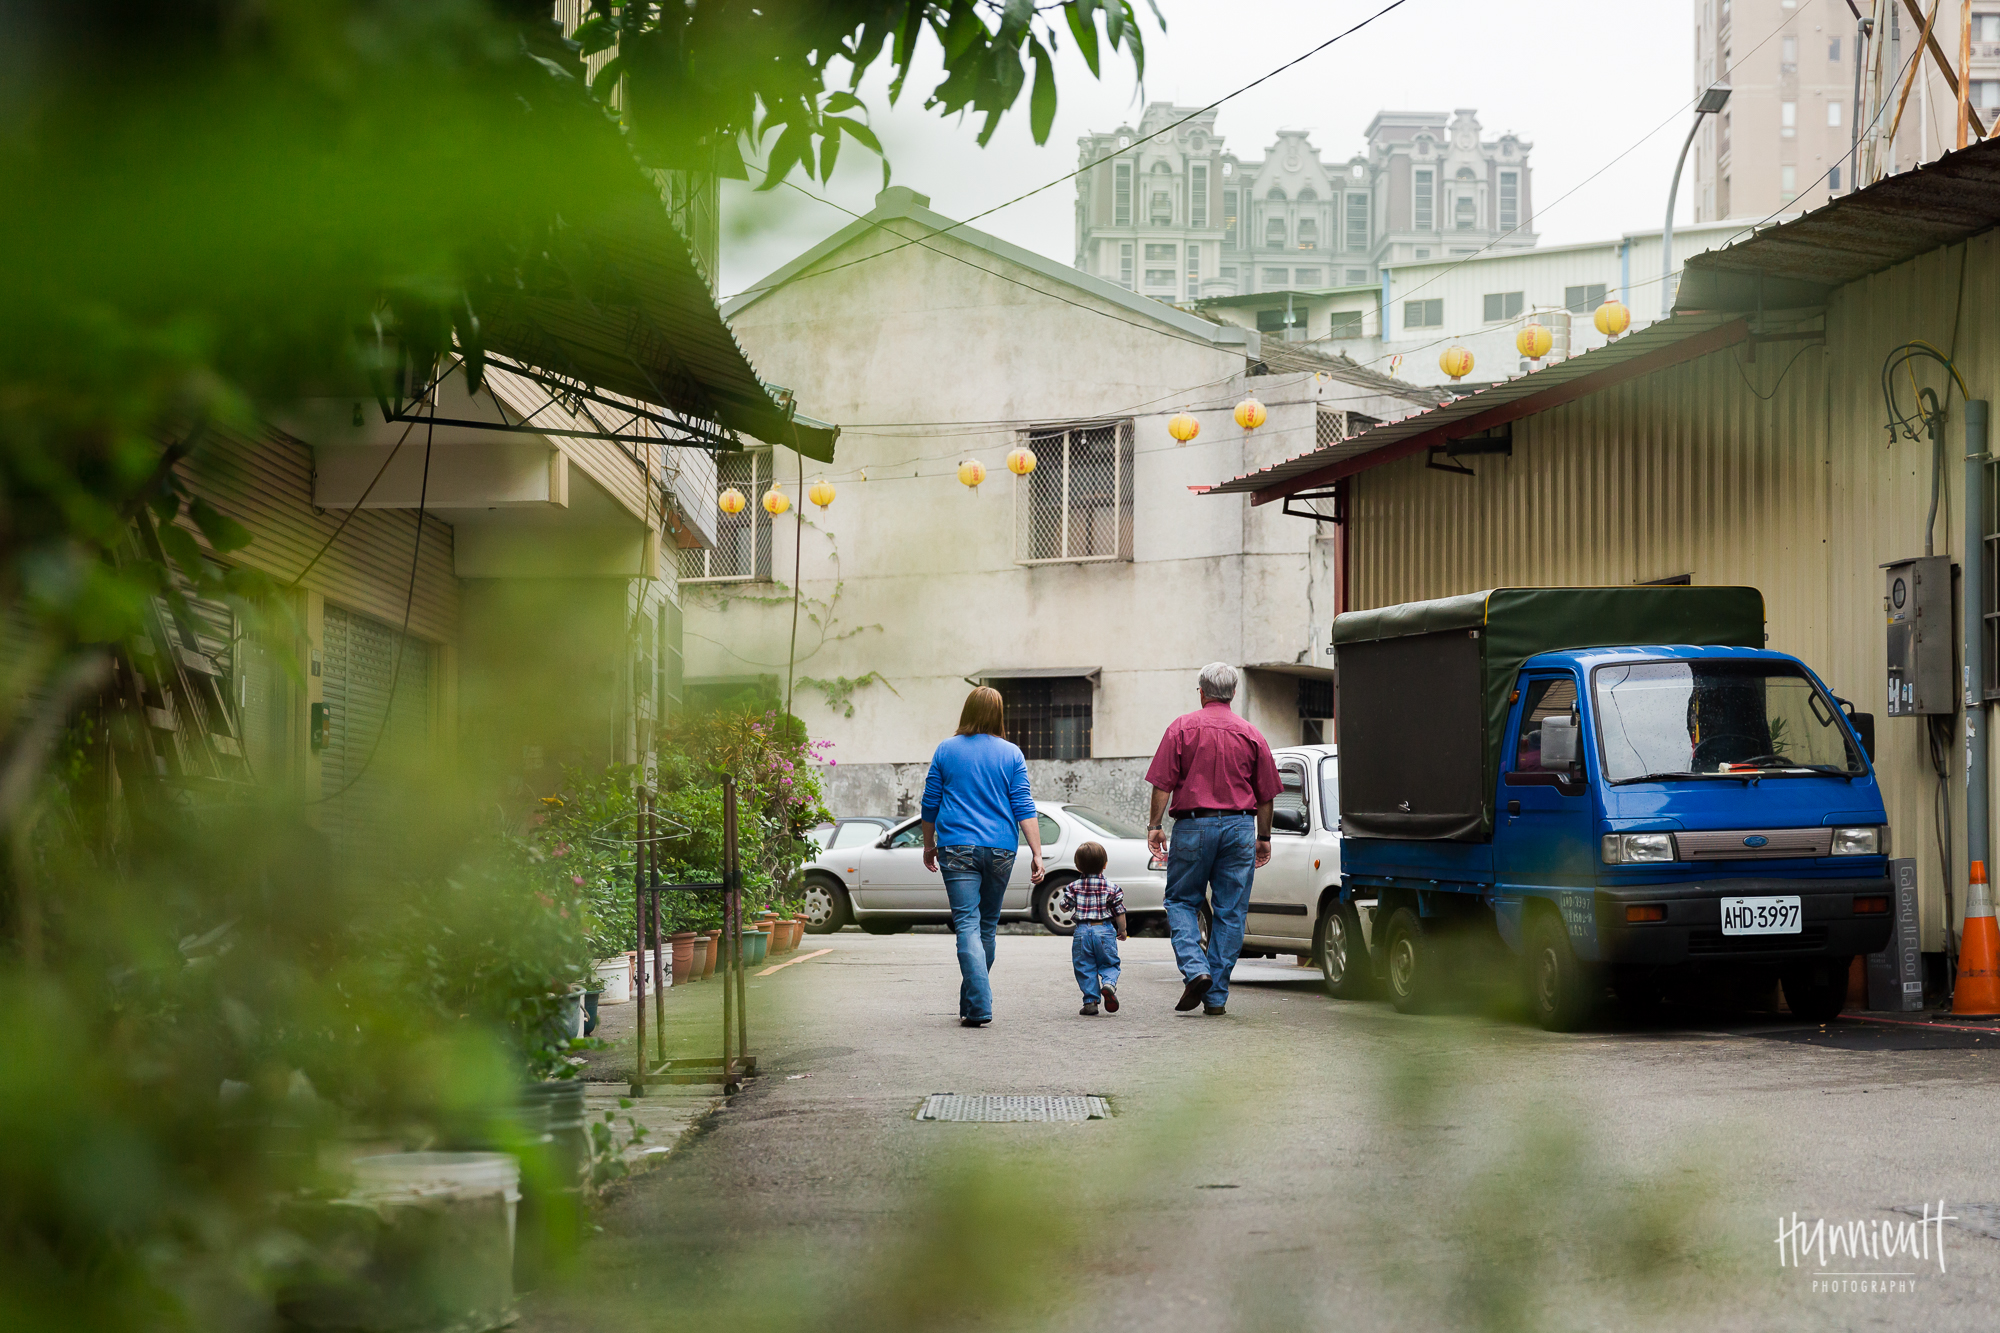 Outdoor-Modern-Urban-Family-Hunnicutt-Photography-Rebecca-Hunnicutt-Farren-Taichung-Taiwan-Exploring-Neighborhood-13